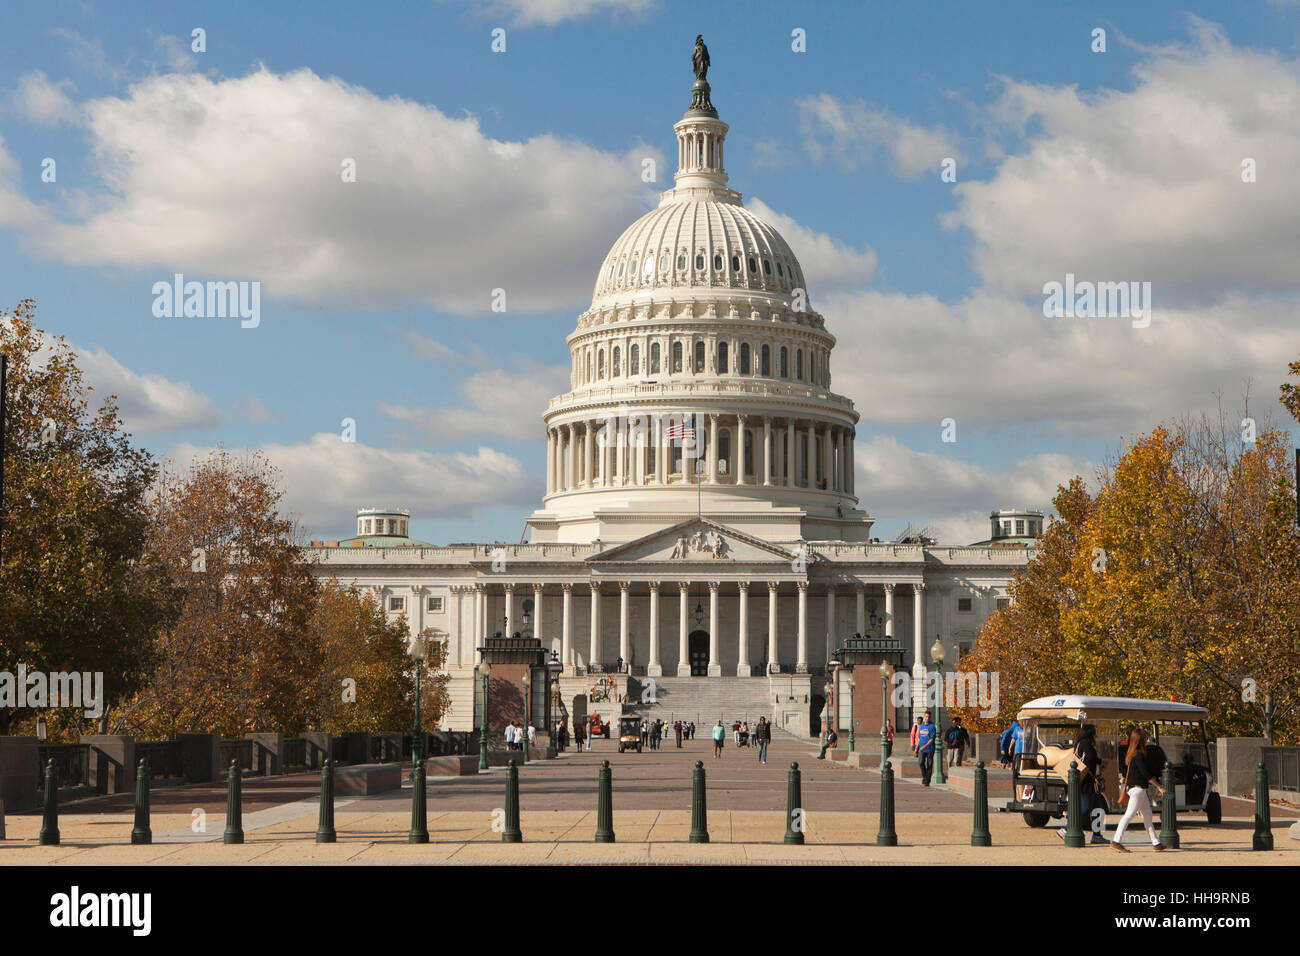 The US Capitol building east portico - Washington, DC USA - Stock Image